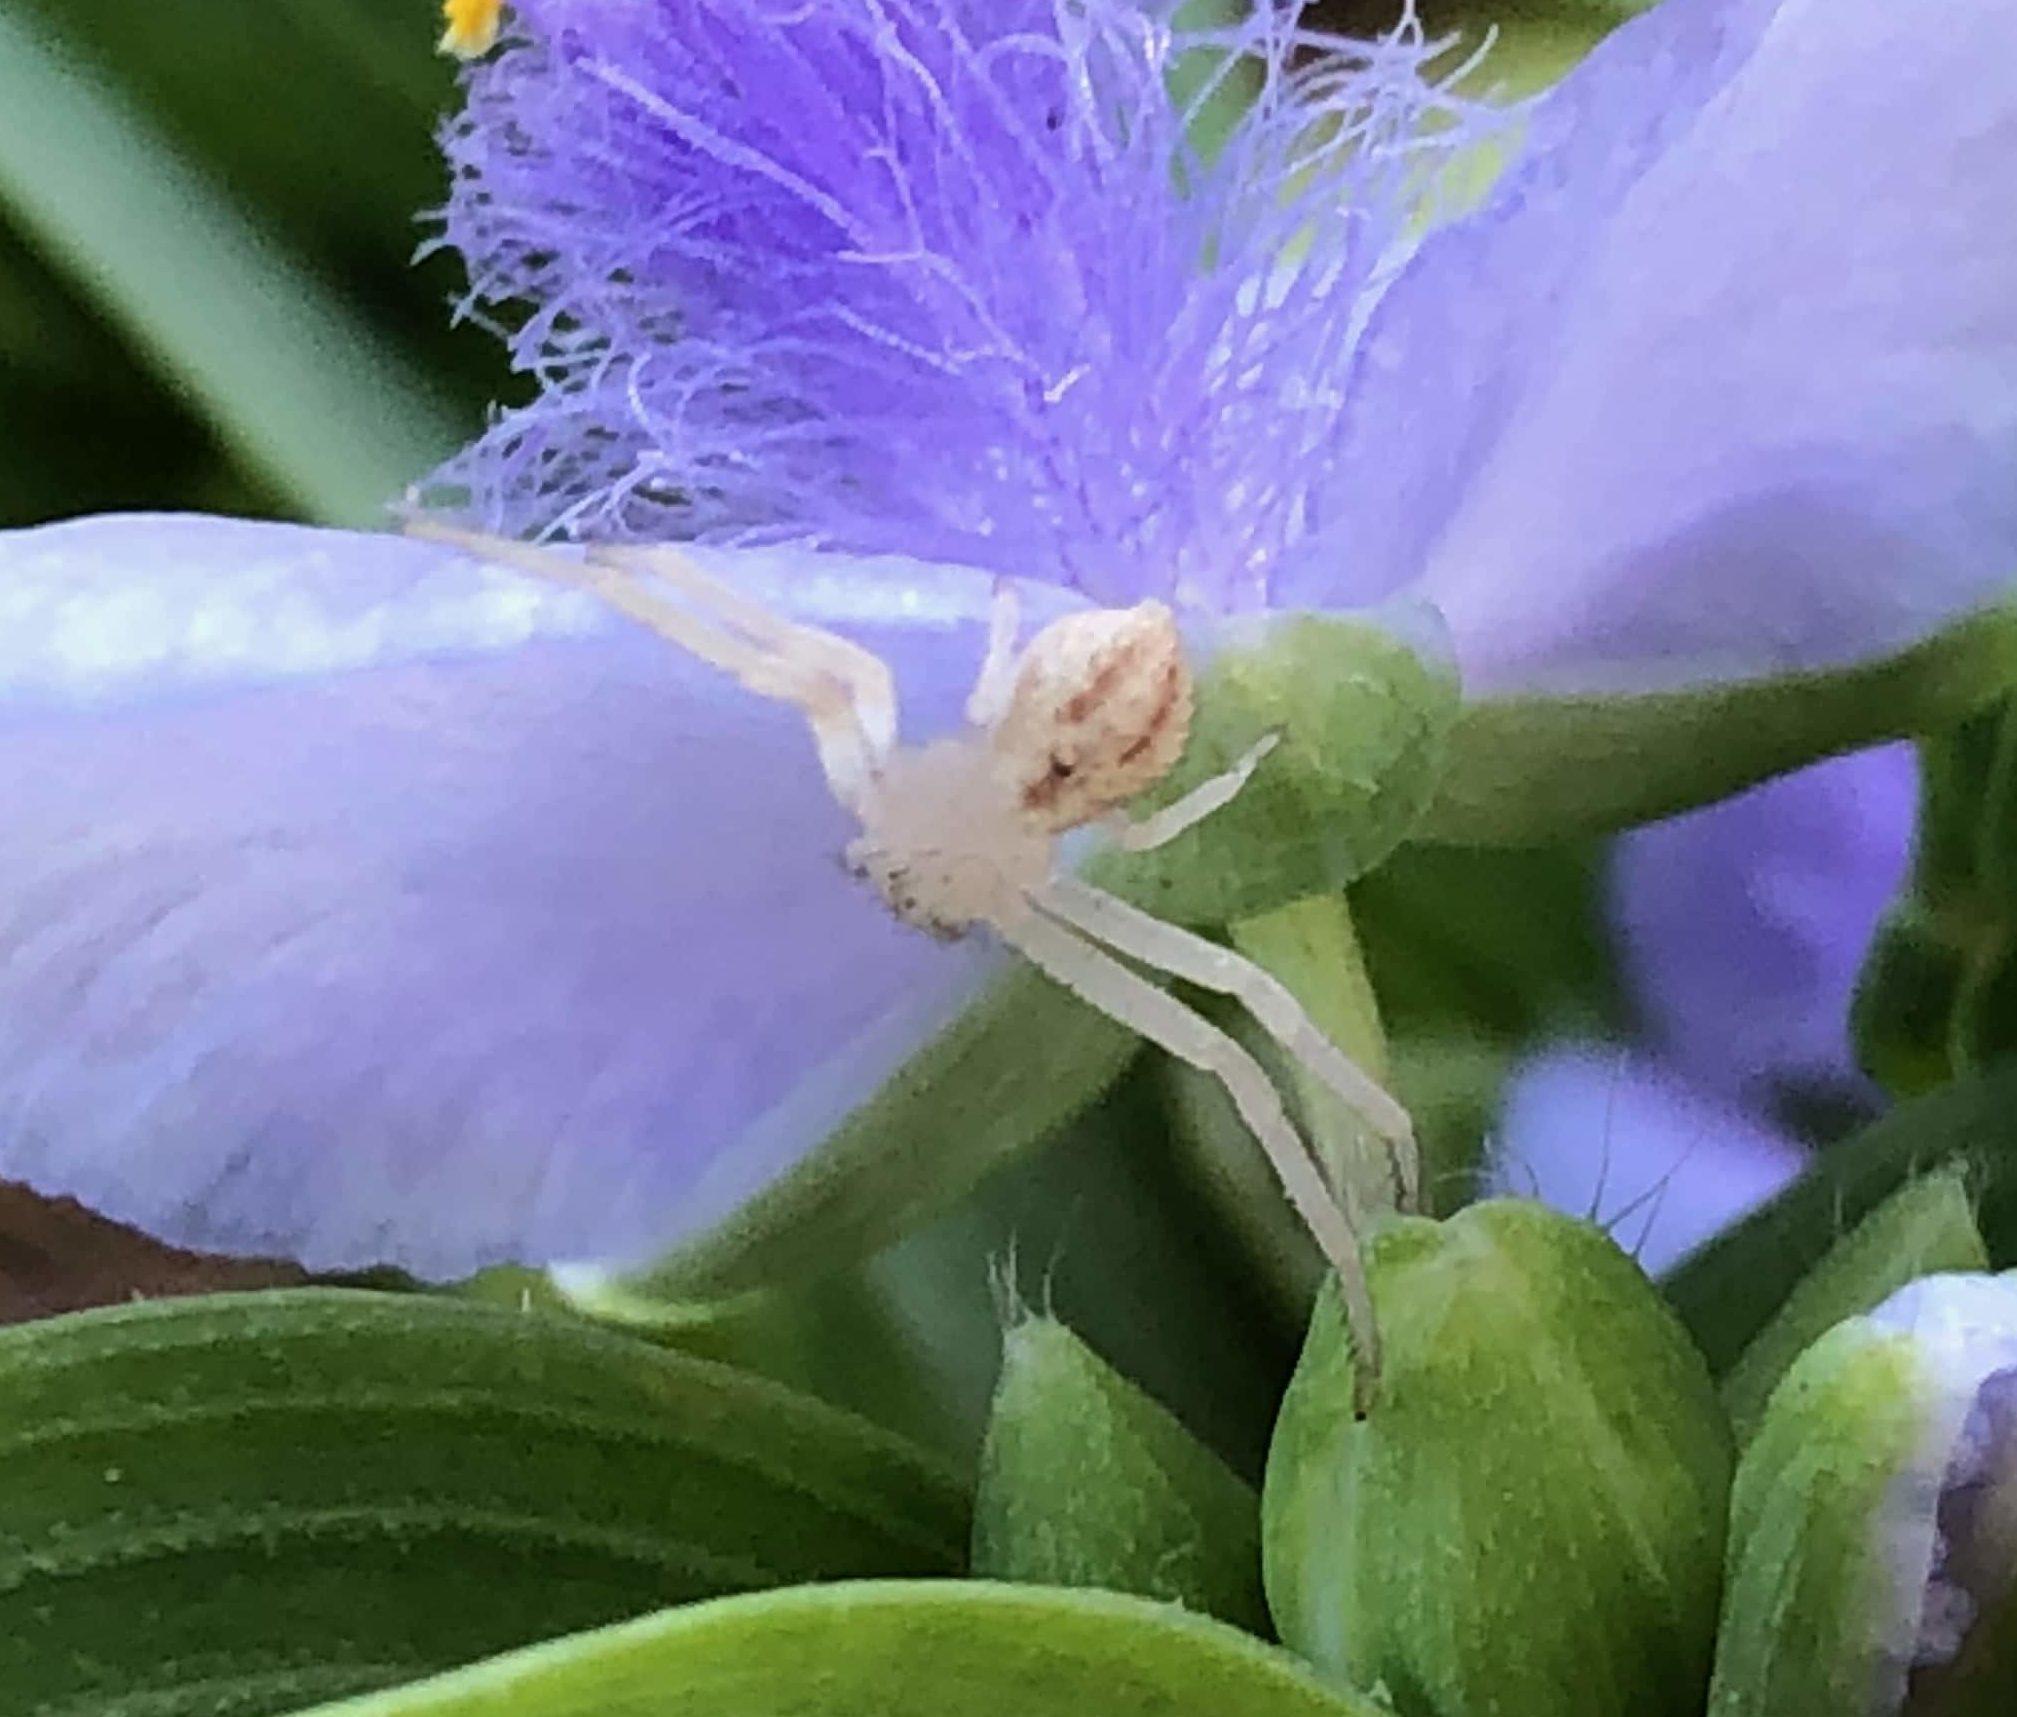 Picture of Mecaphesa - Dorsal